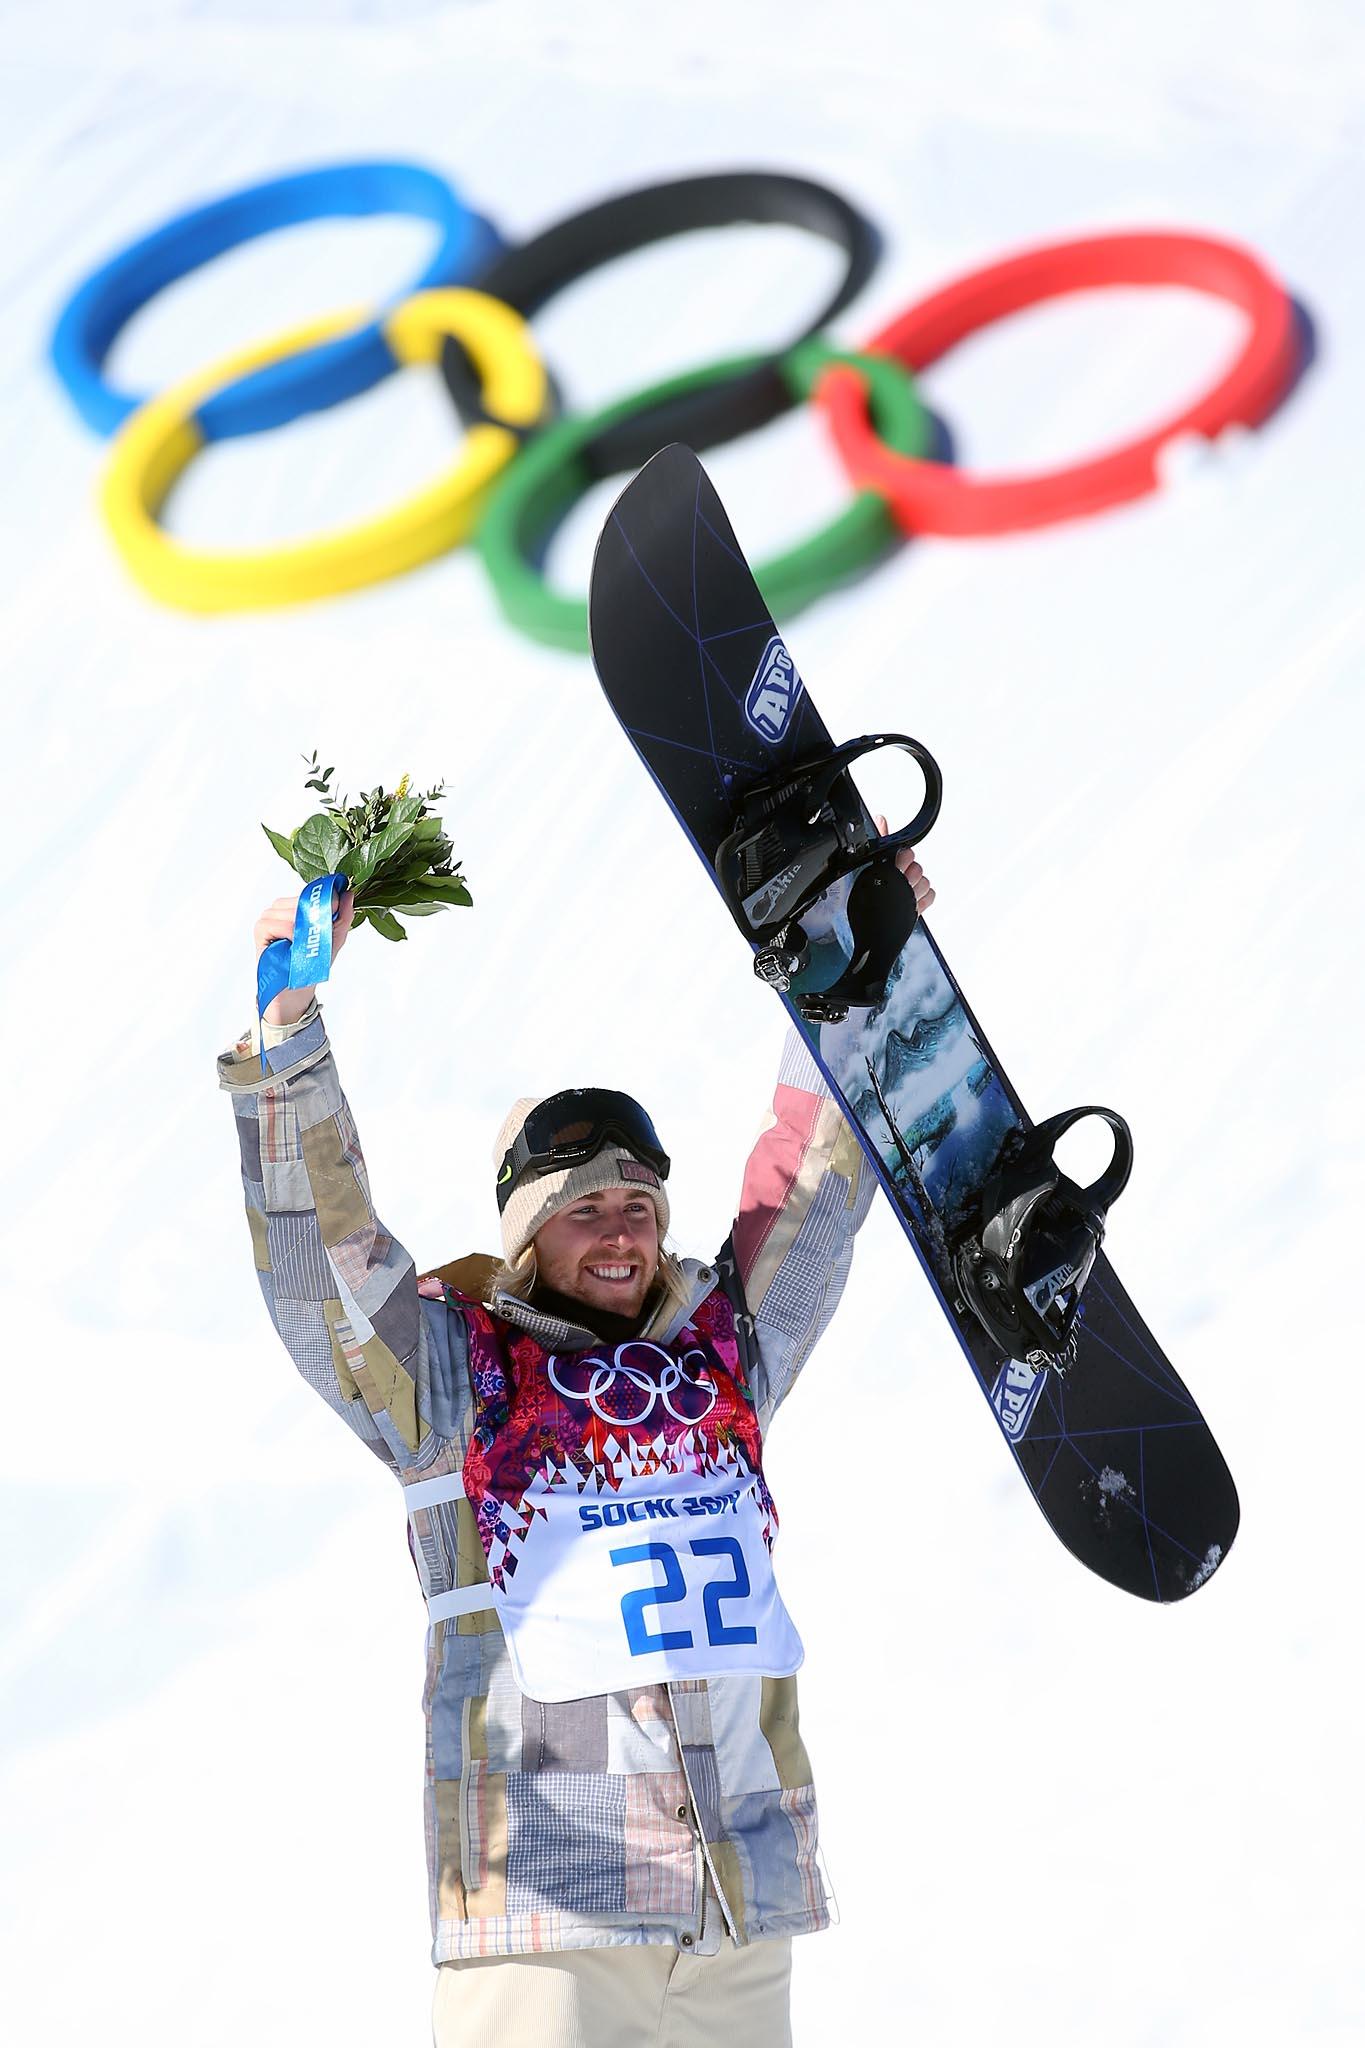 2014-olympic-moments-kotsenburg1.jpg